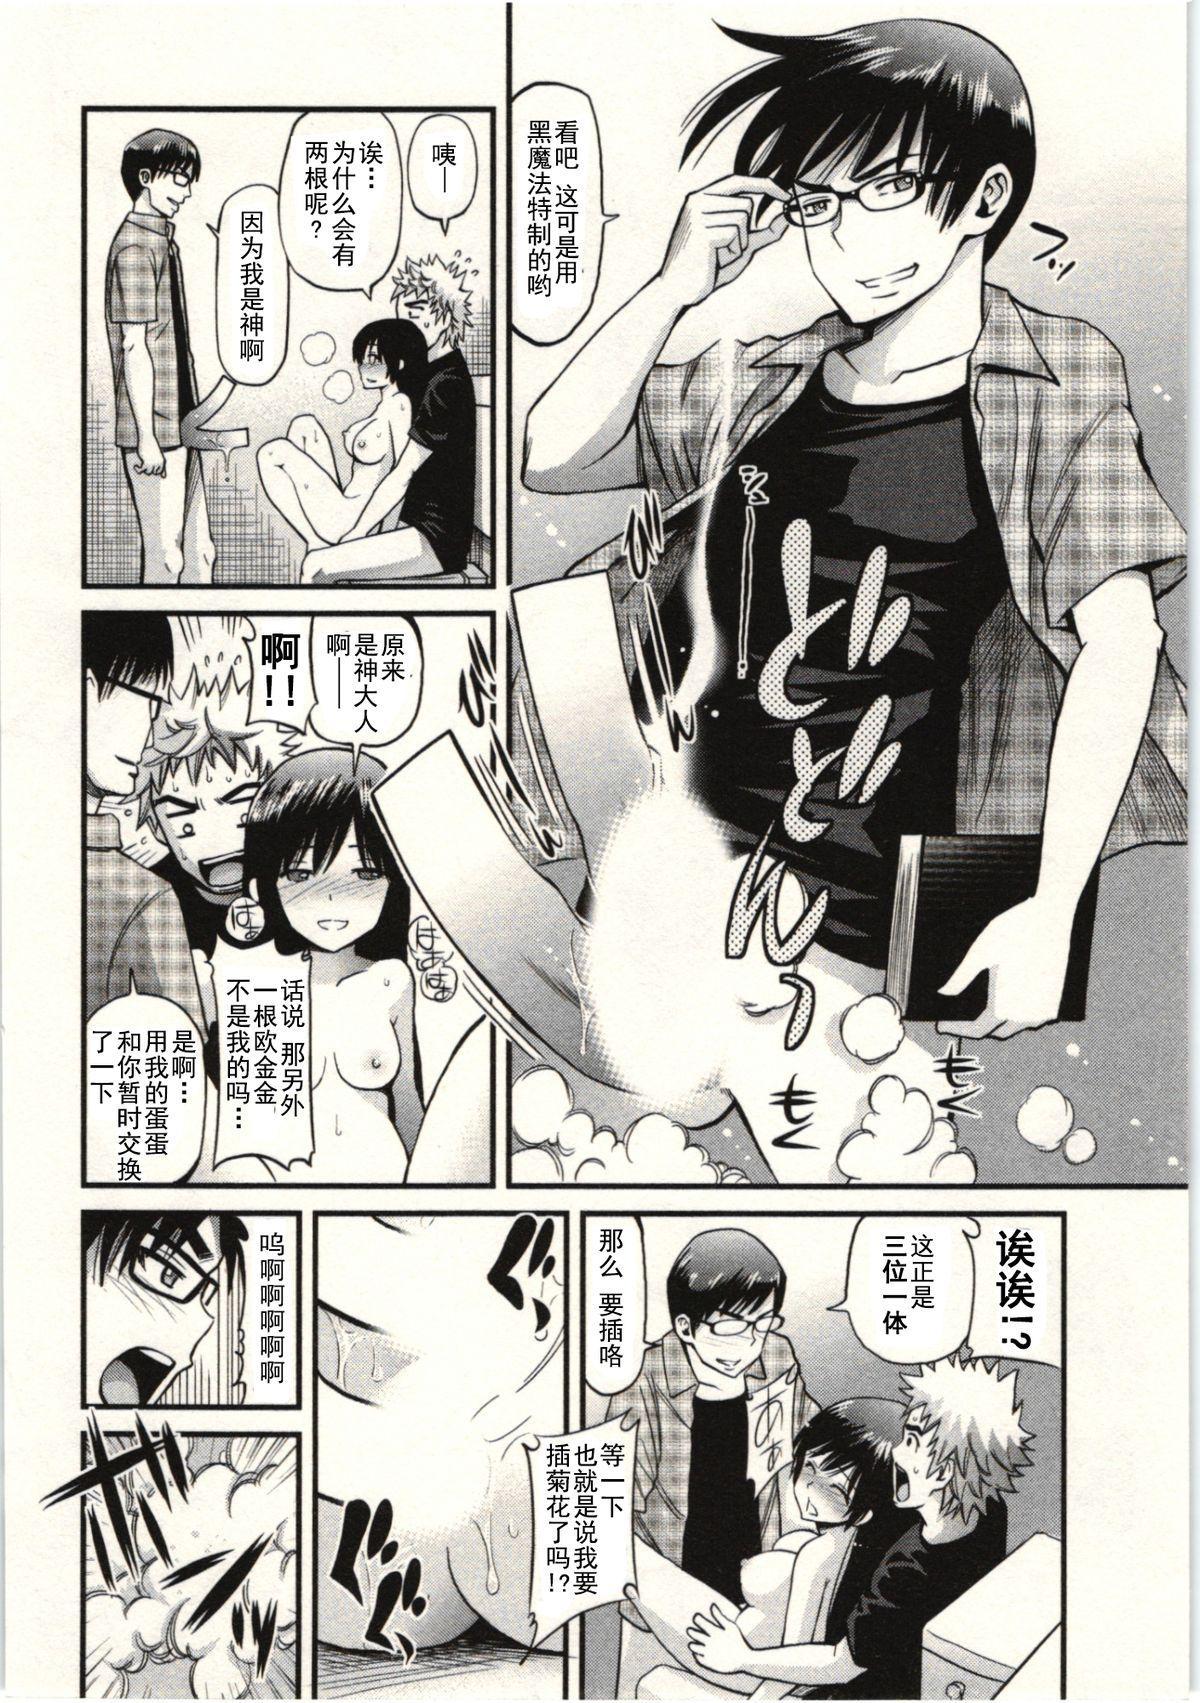 Tadashii Majutsu no Asobikata - The right way of playing of magic. 20